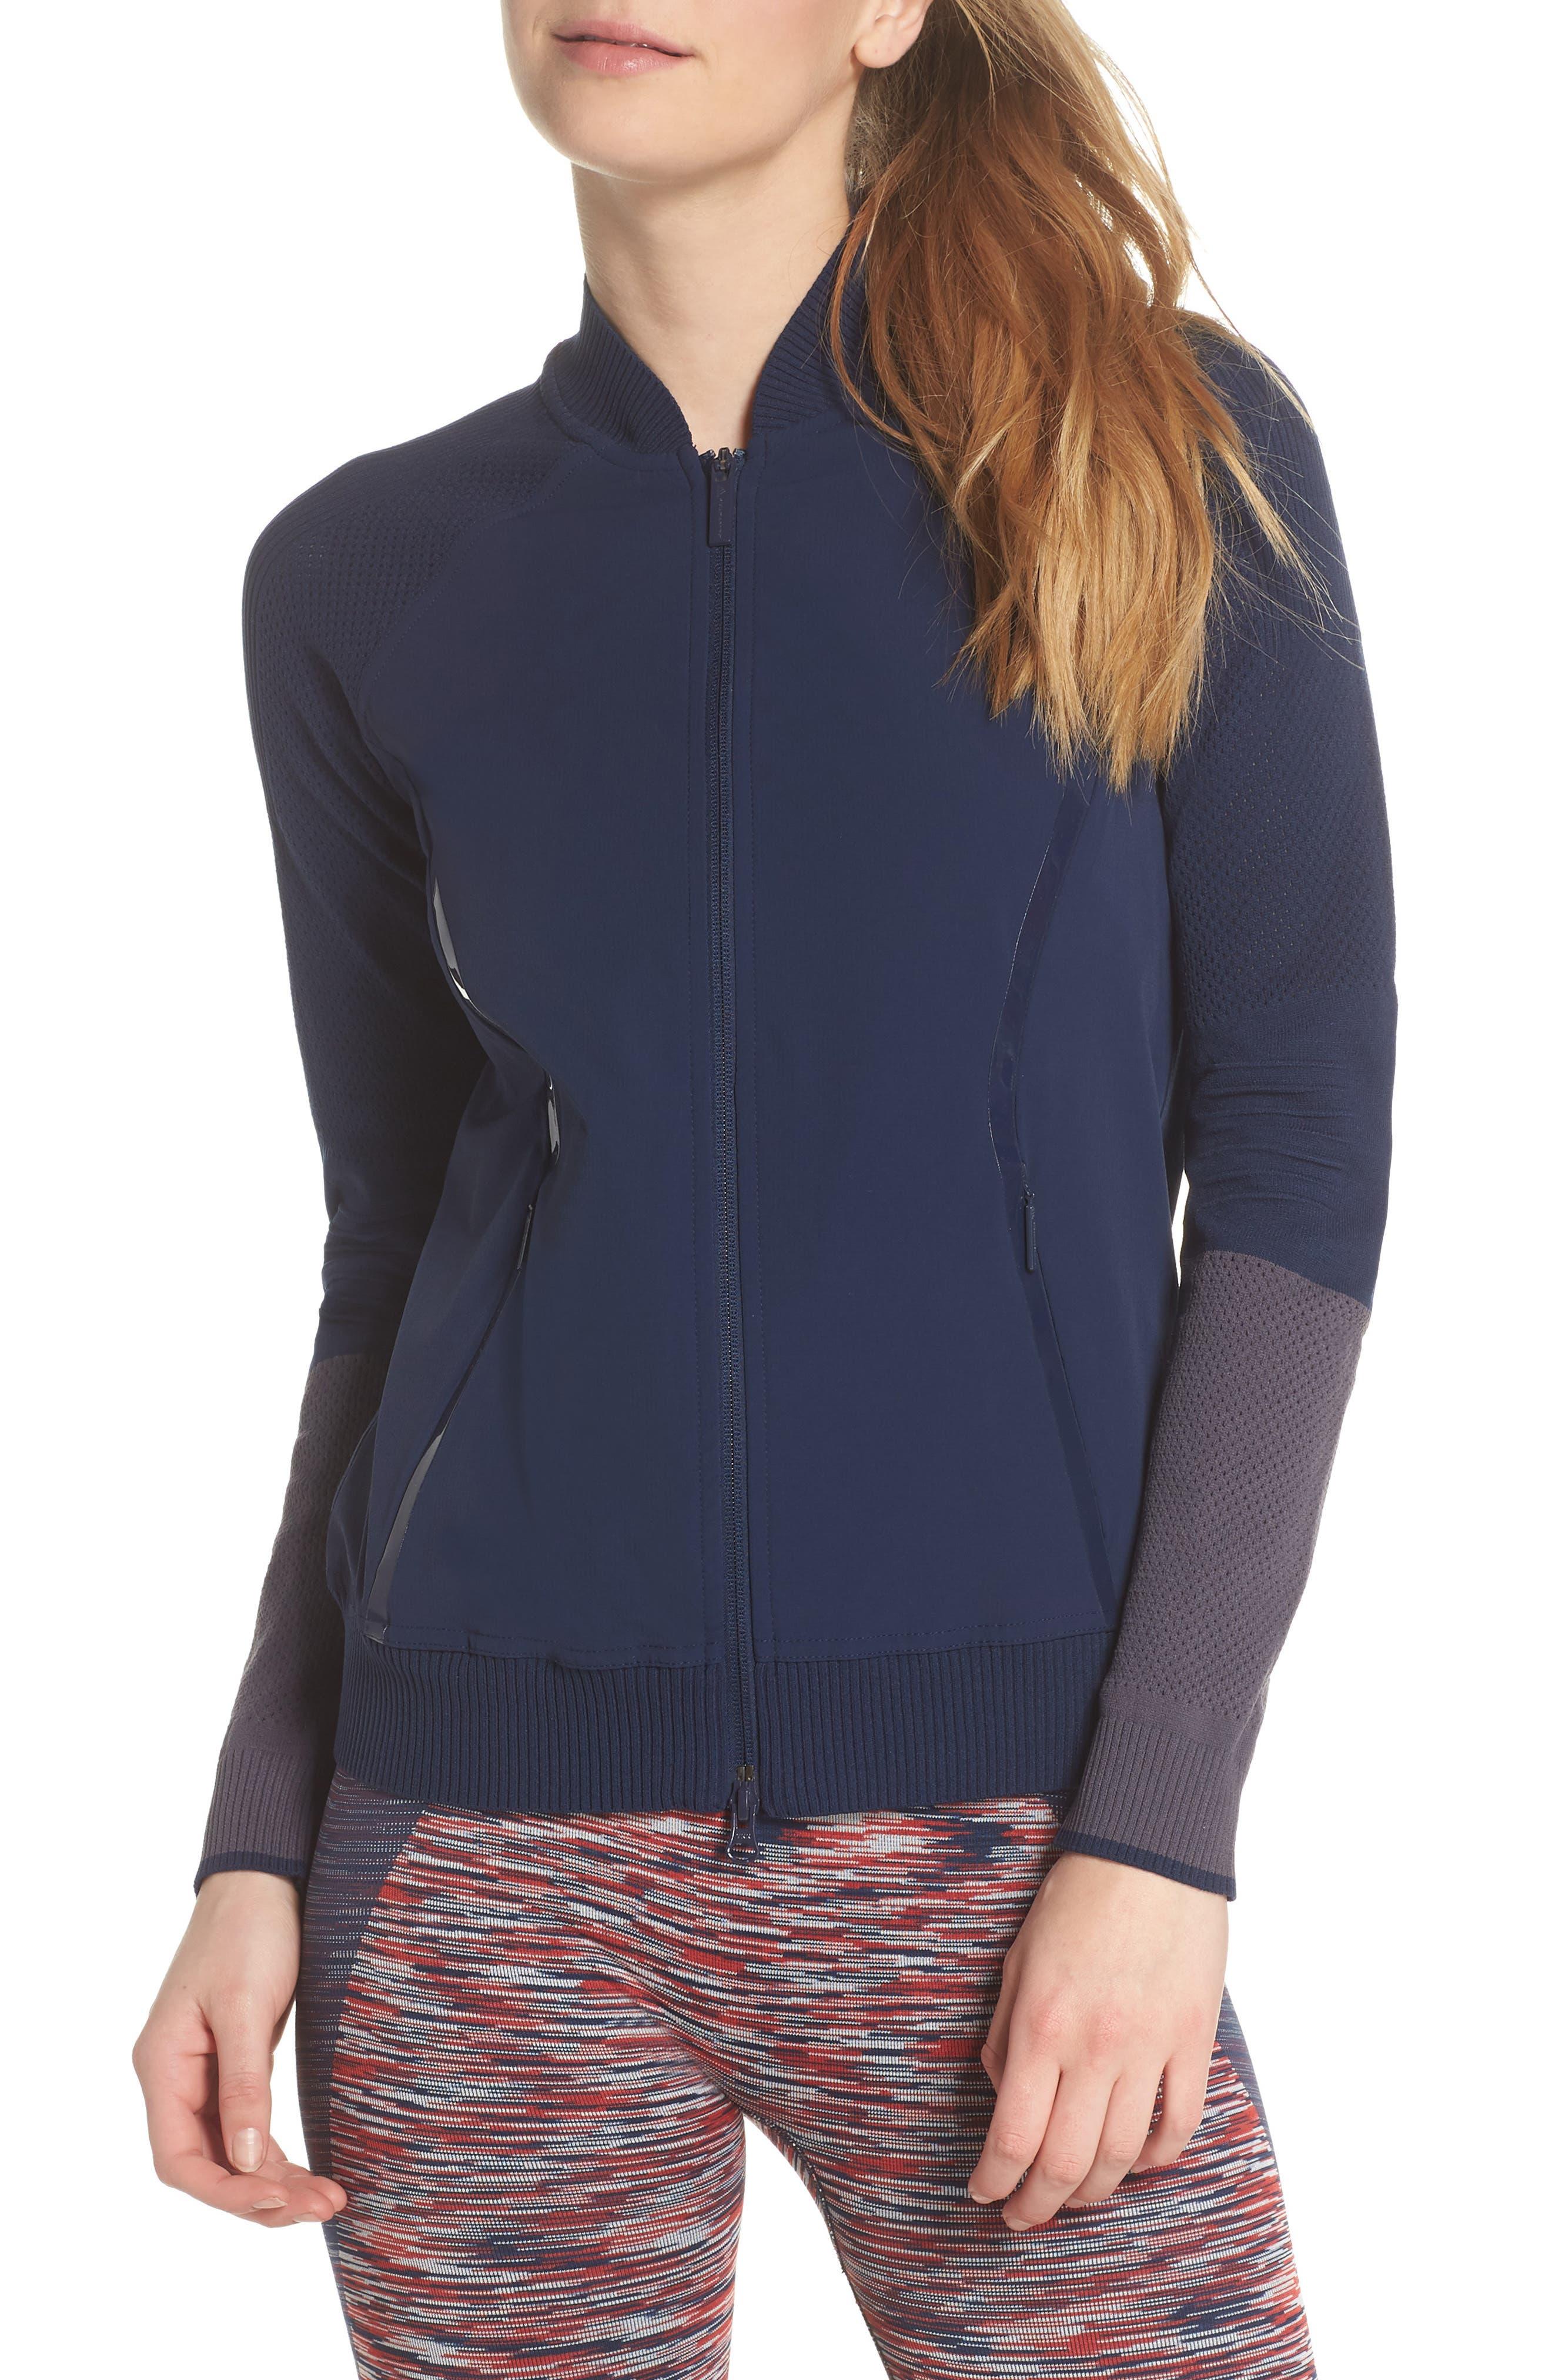 Run Ultra Knit & Woven Jacket,                         Main,                         color, 415